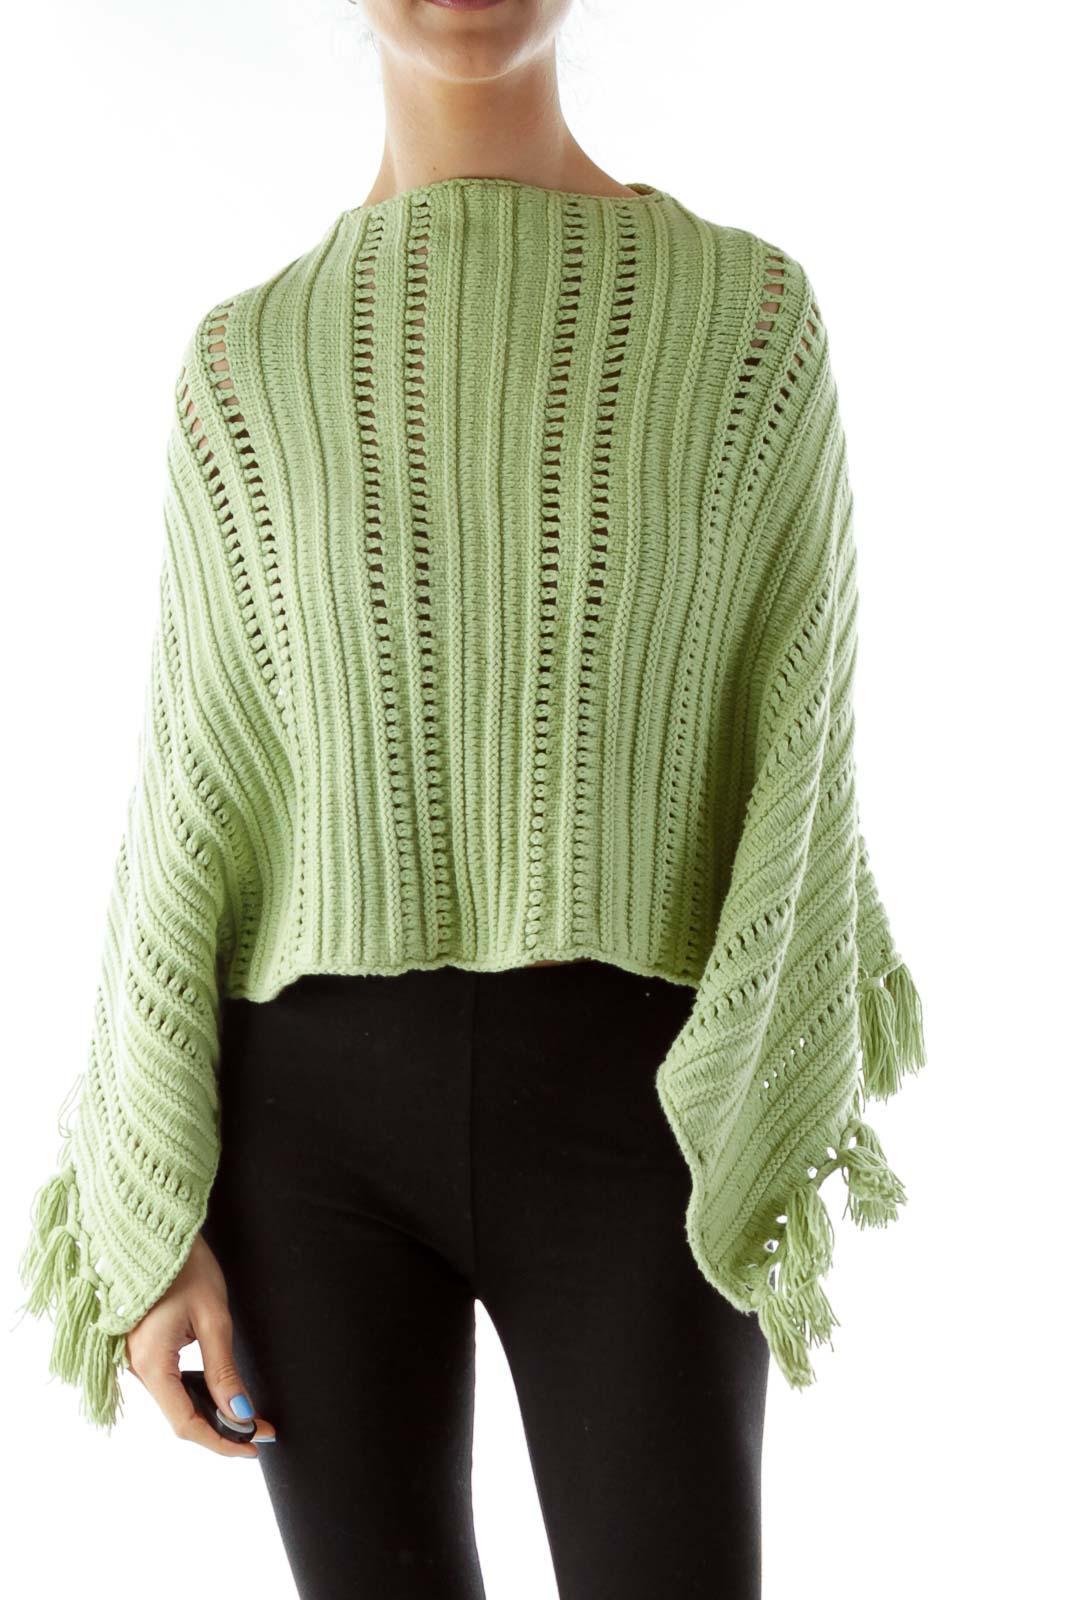 Green Crocheted Poncho w/ Tassels